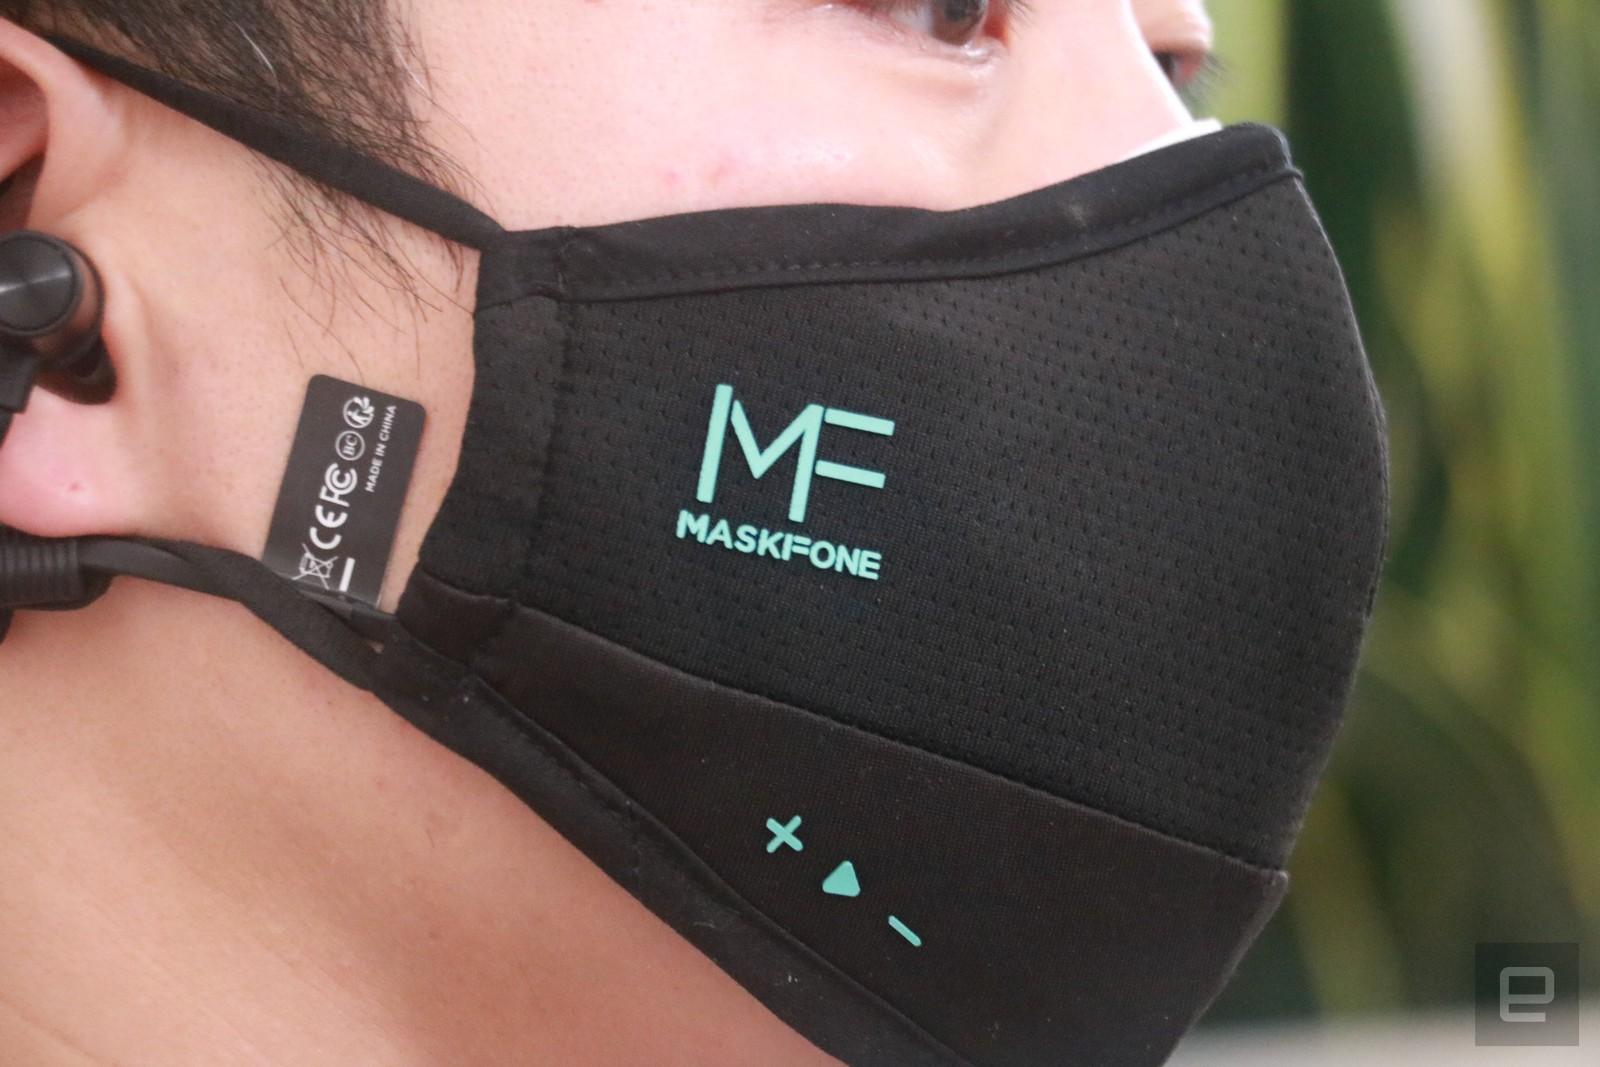 Maskfone hands-on